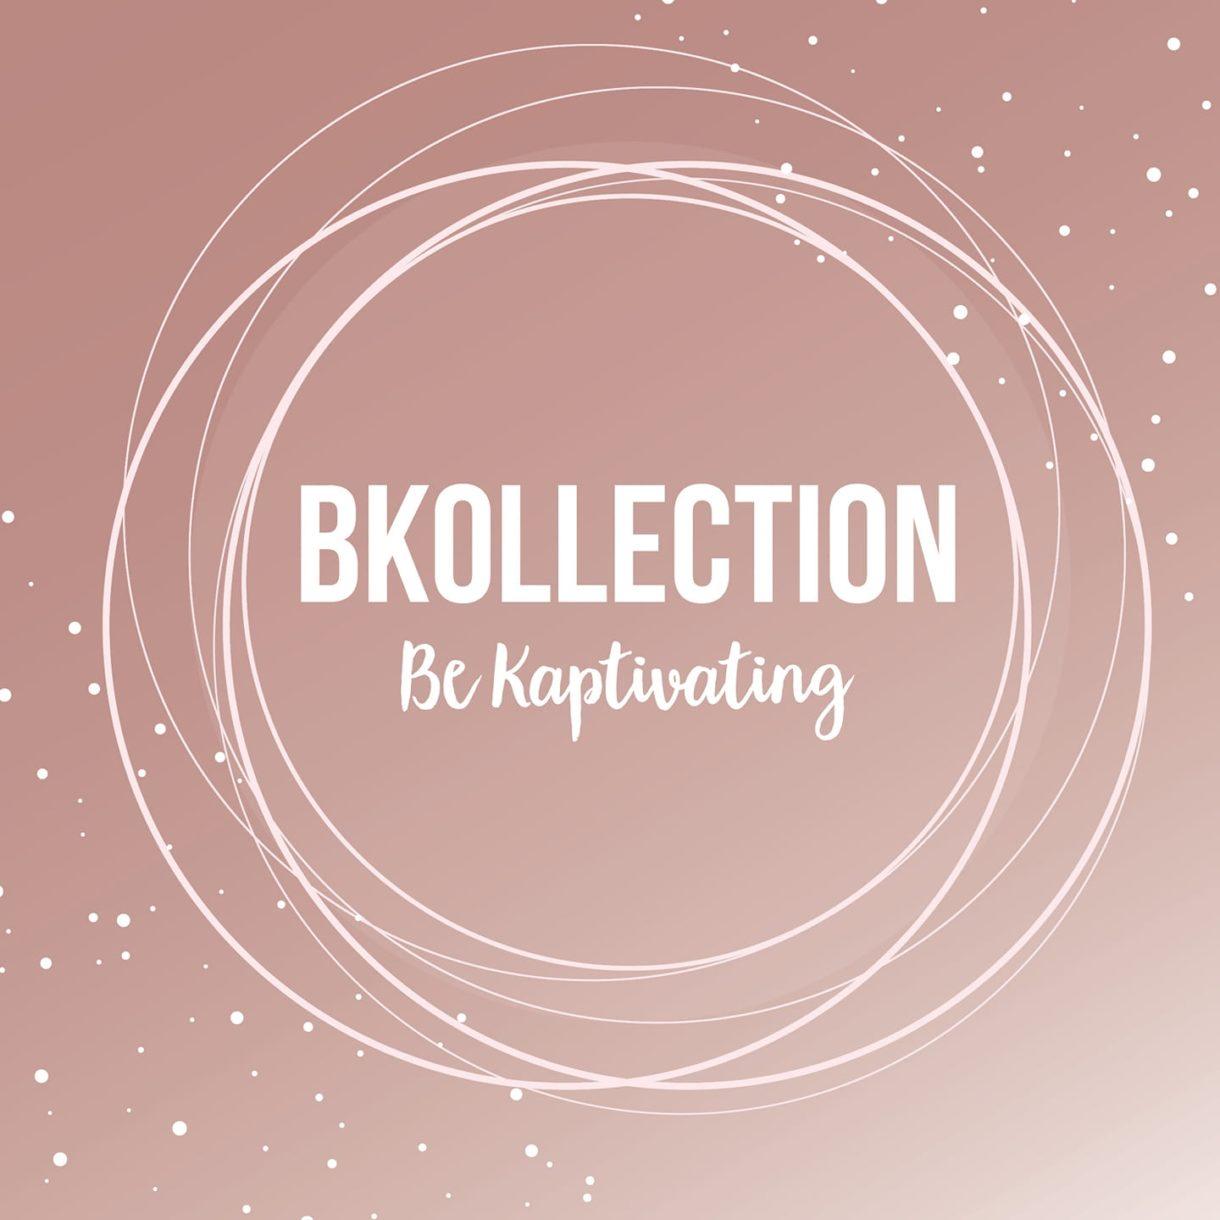 Bkollection